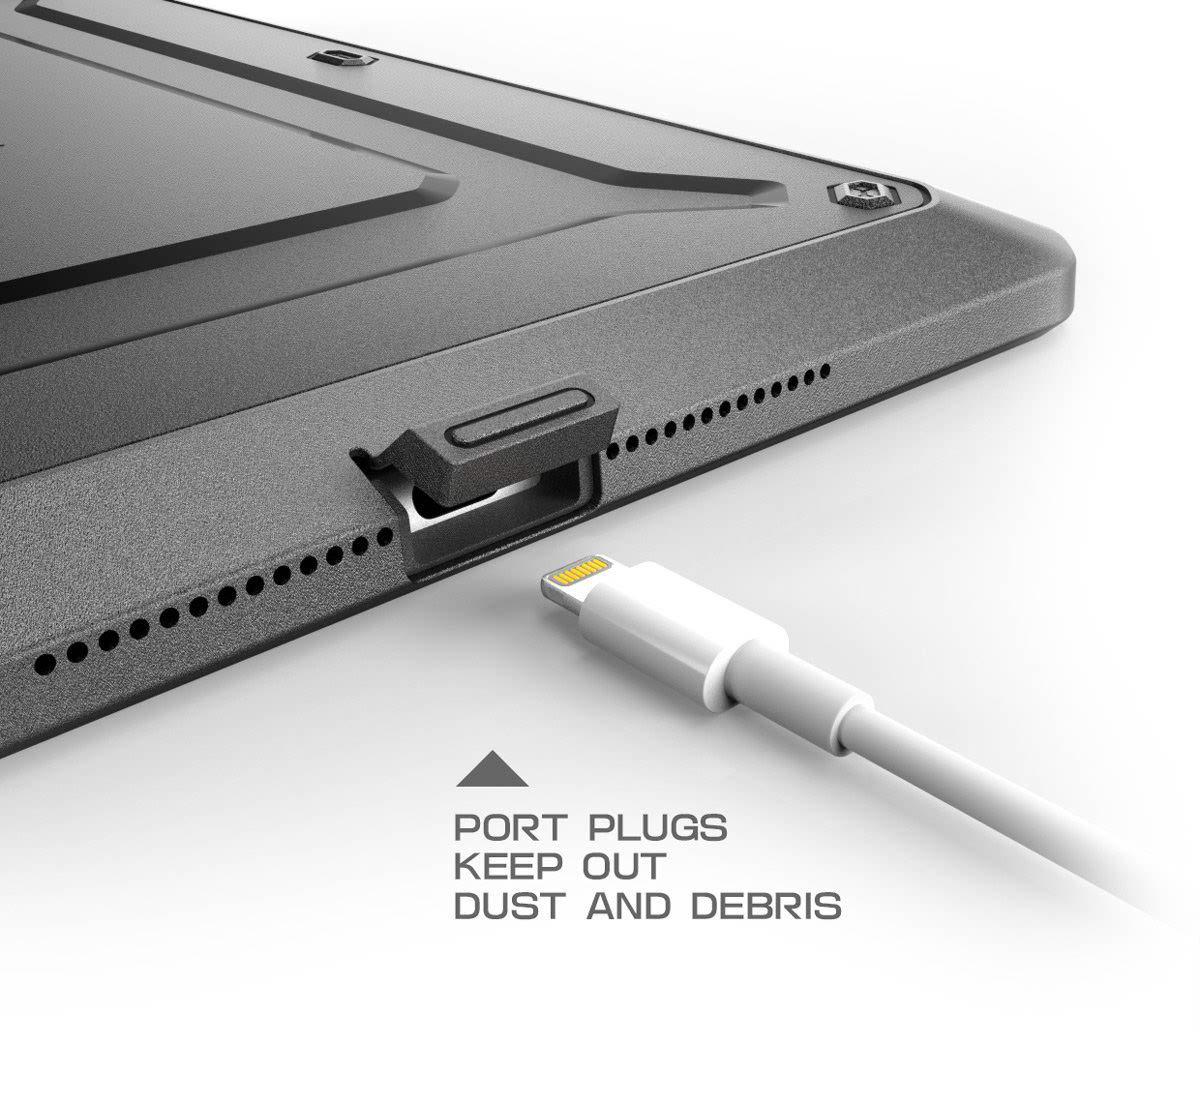 Unicorn Beetle PRO case for iPad Air 2 keeps it safe